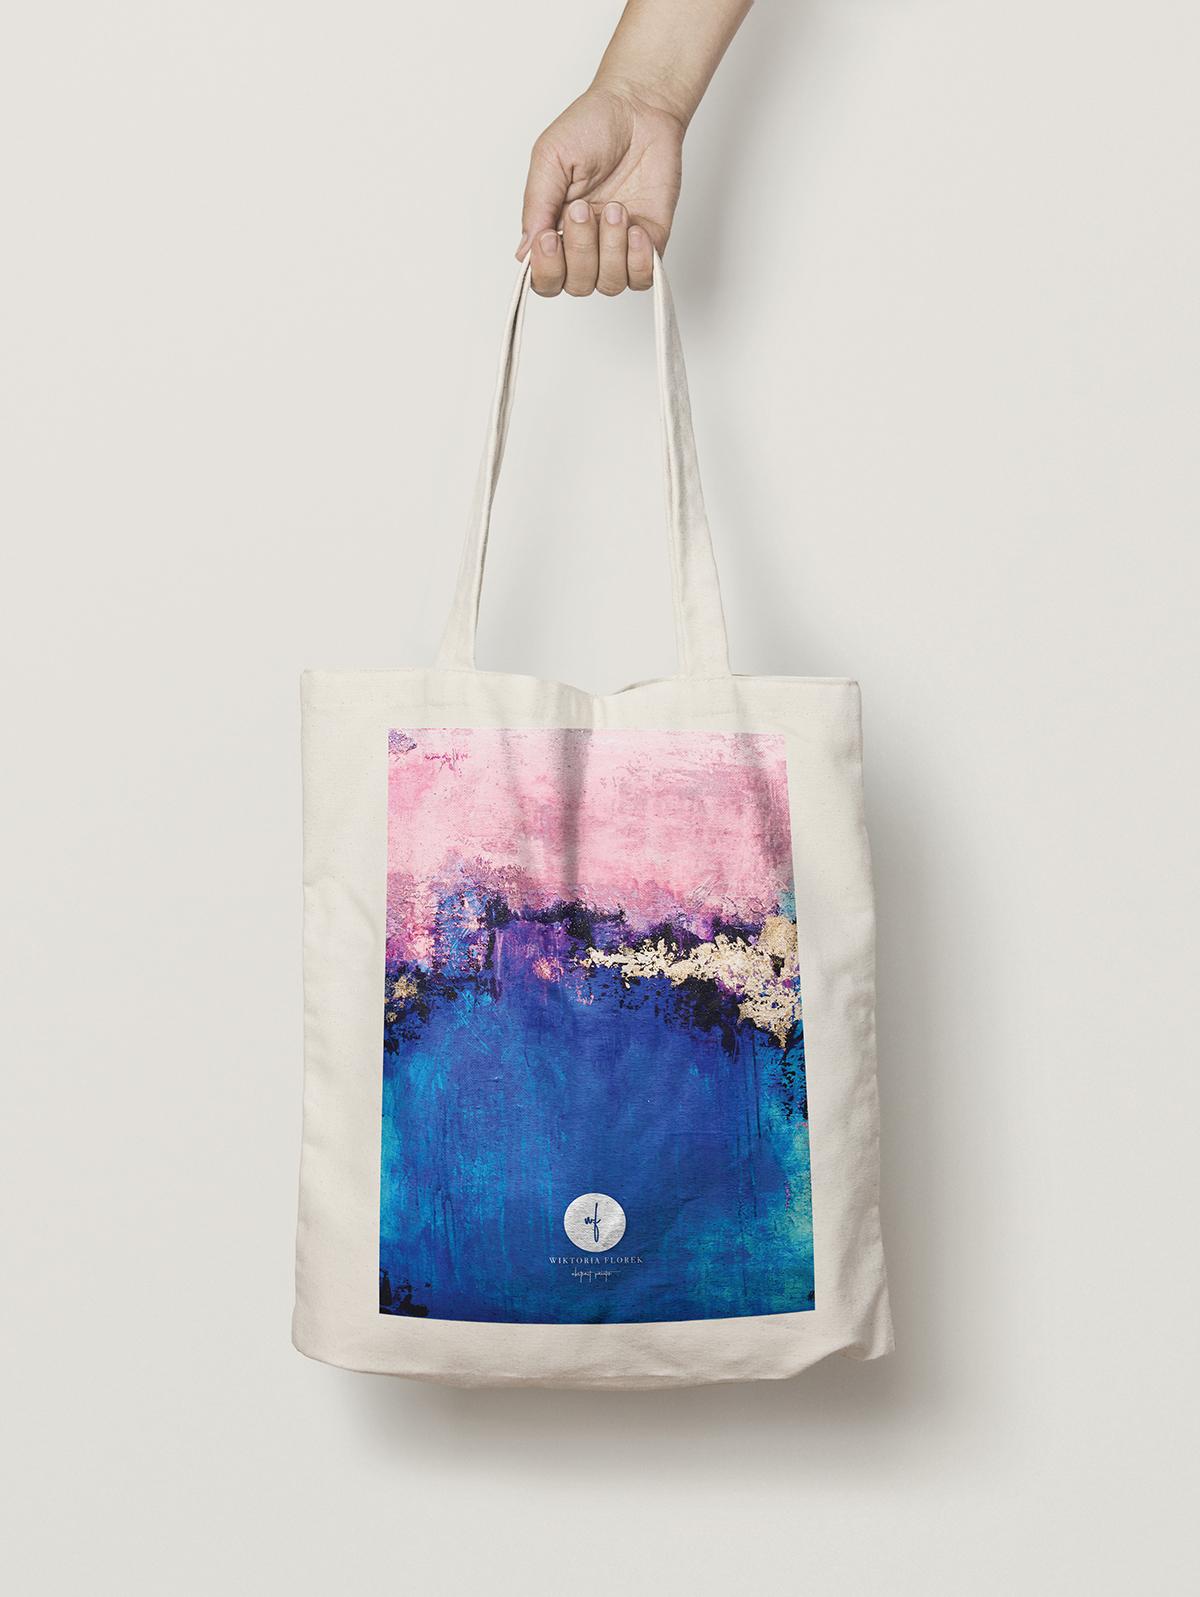 abstract-cotton-bag-dreamy-sky-WF-